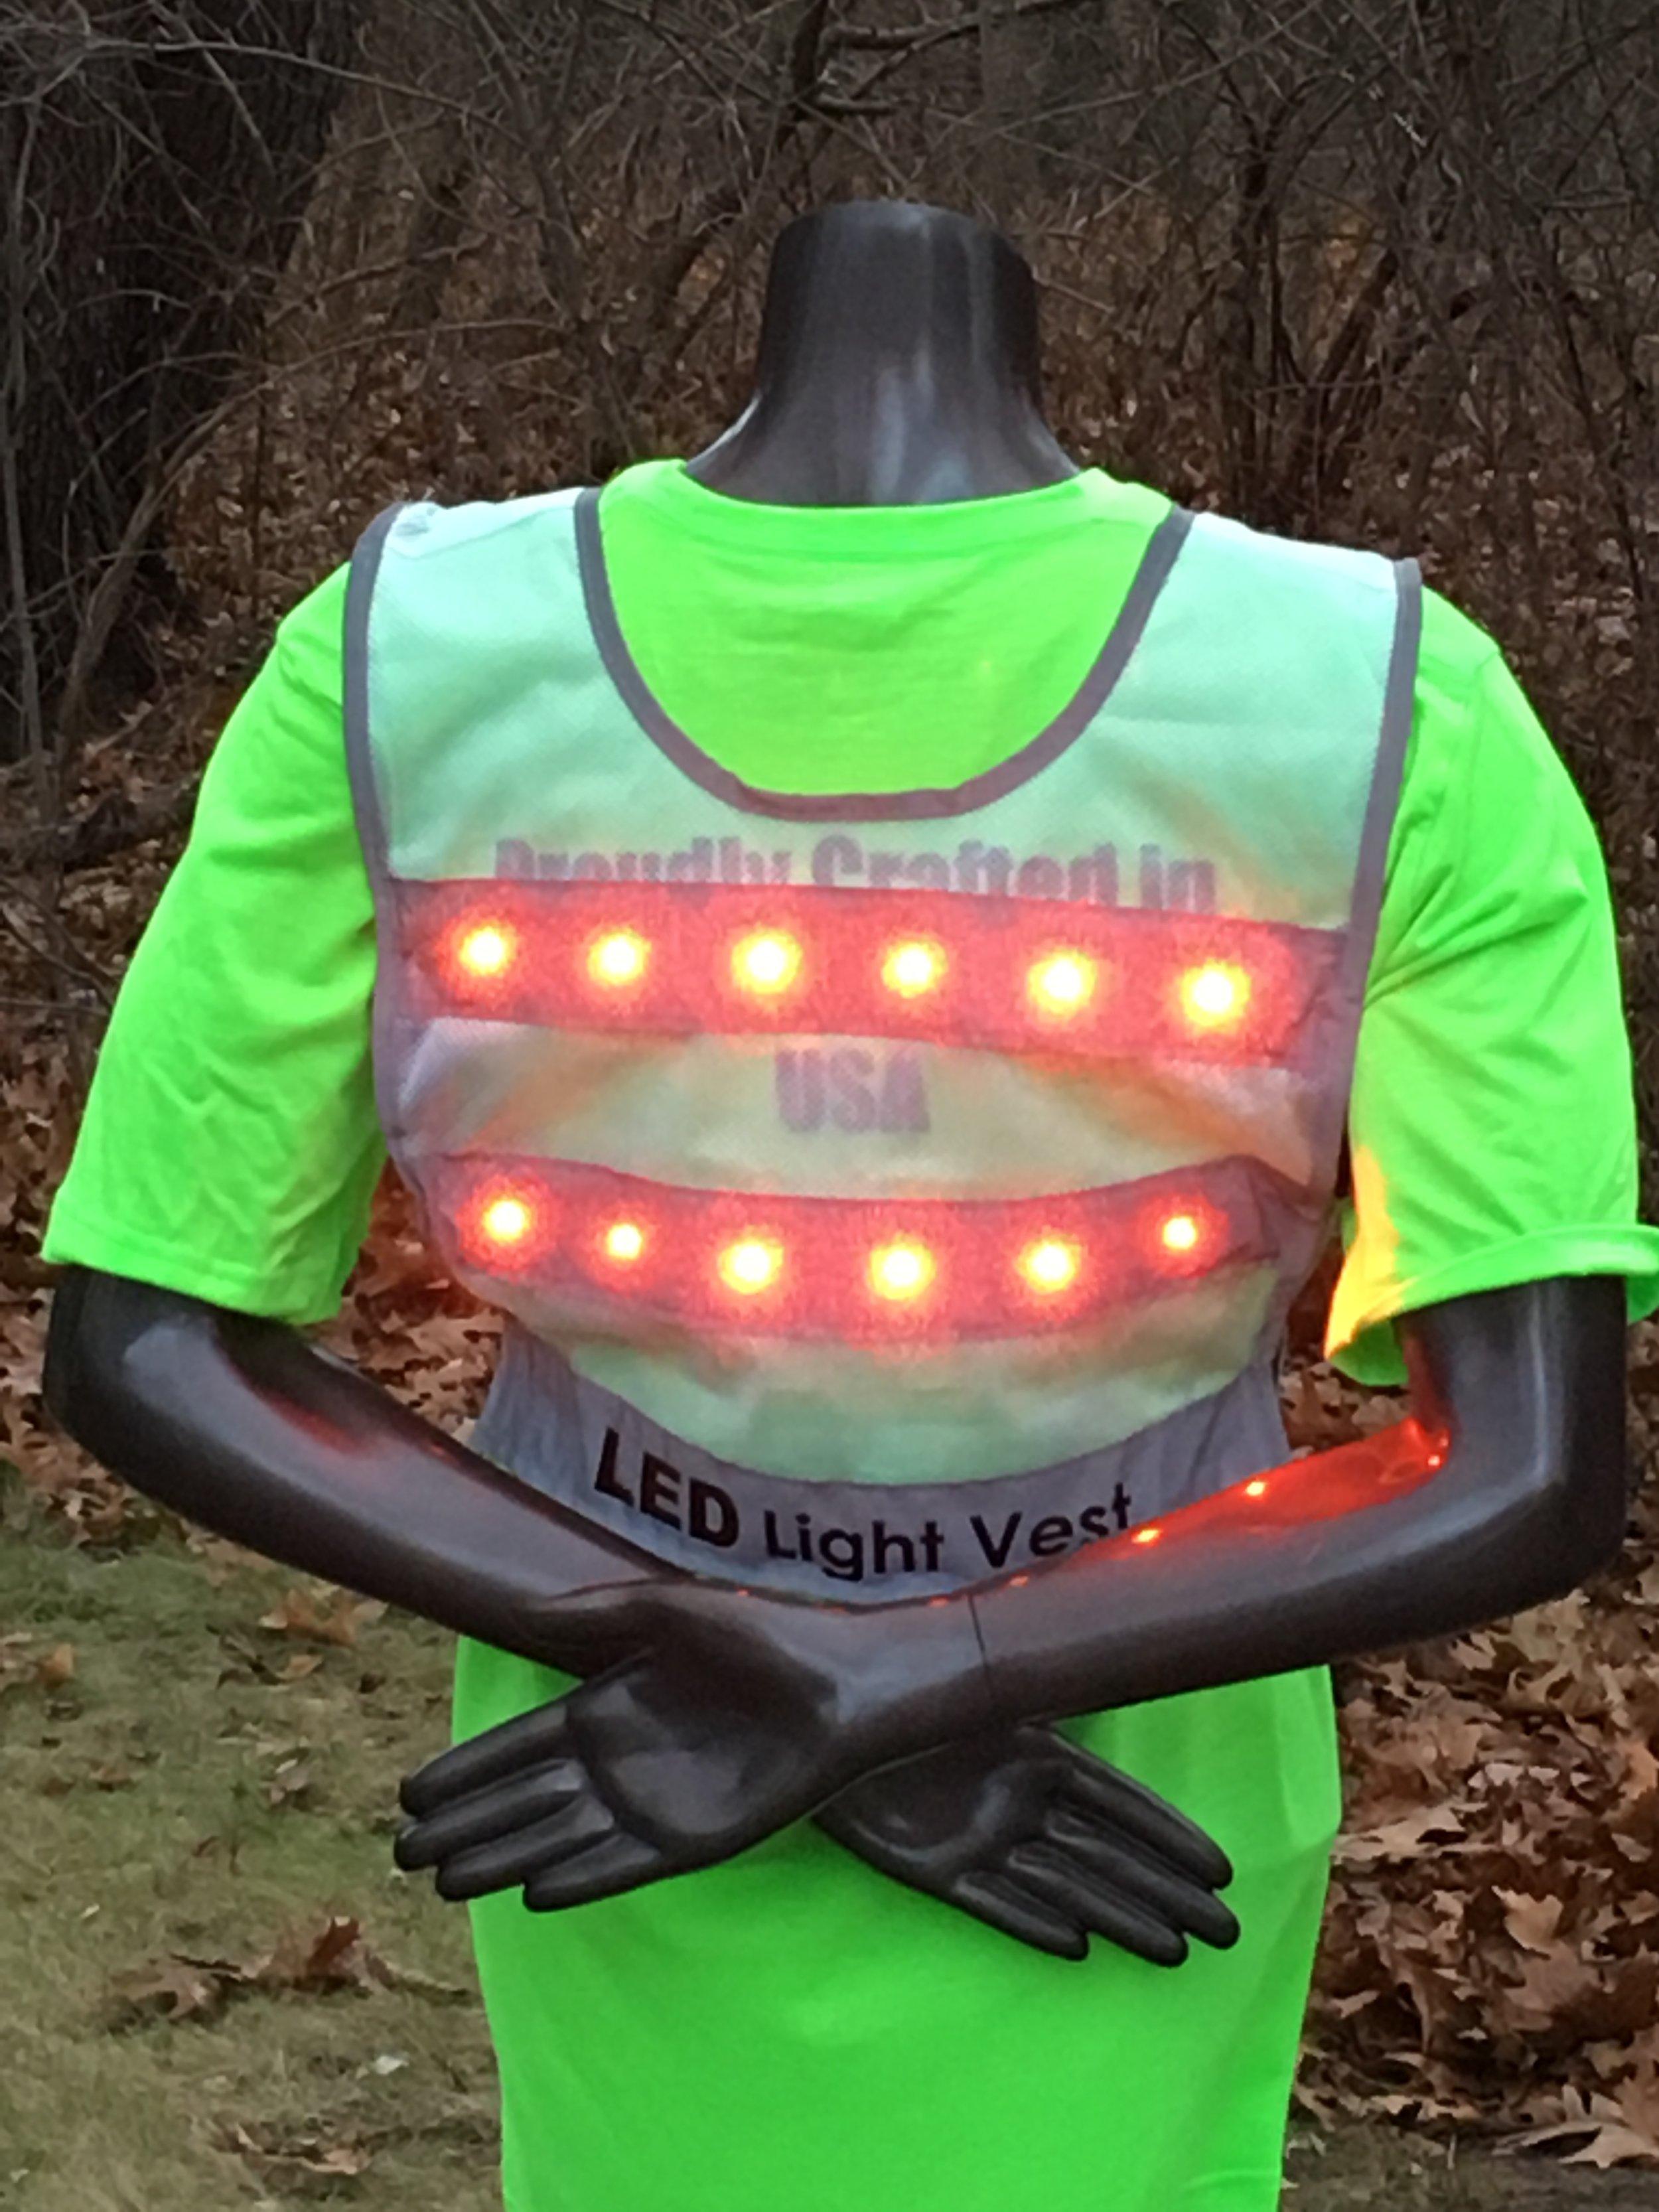 LEDLightvest-small-back-safety-vest-experts----Grand Rapids-MI.JPG